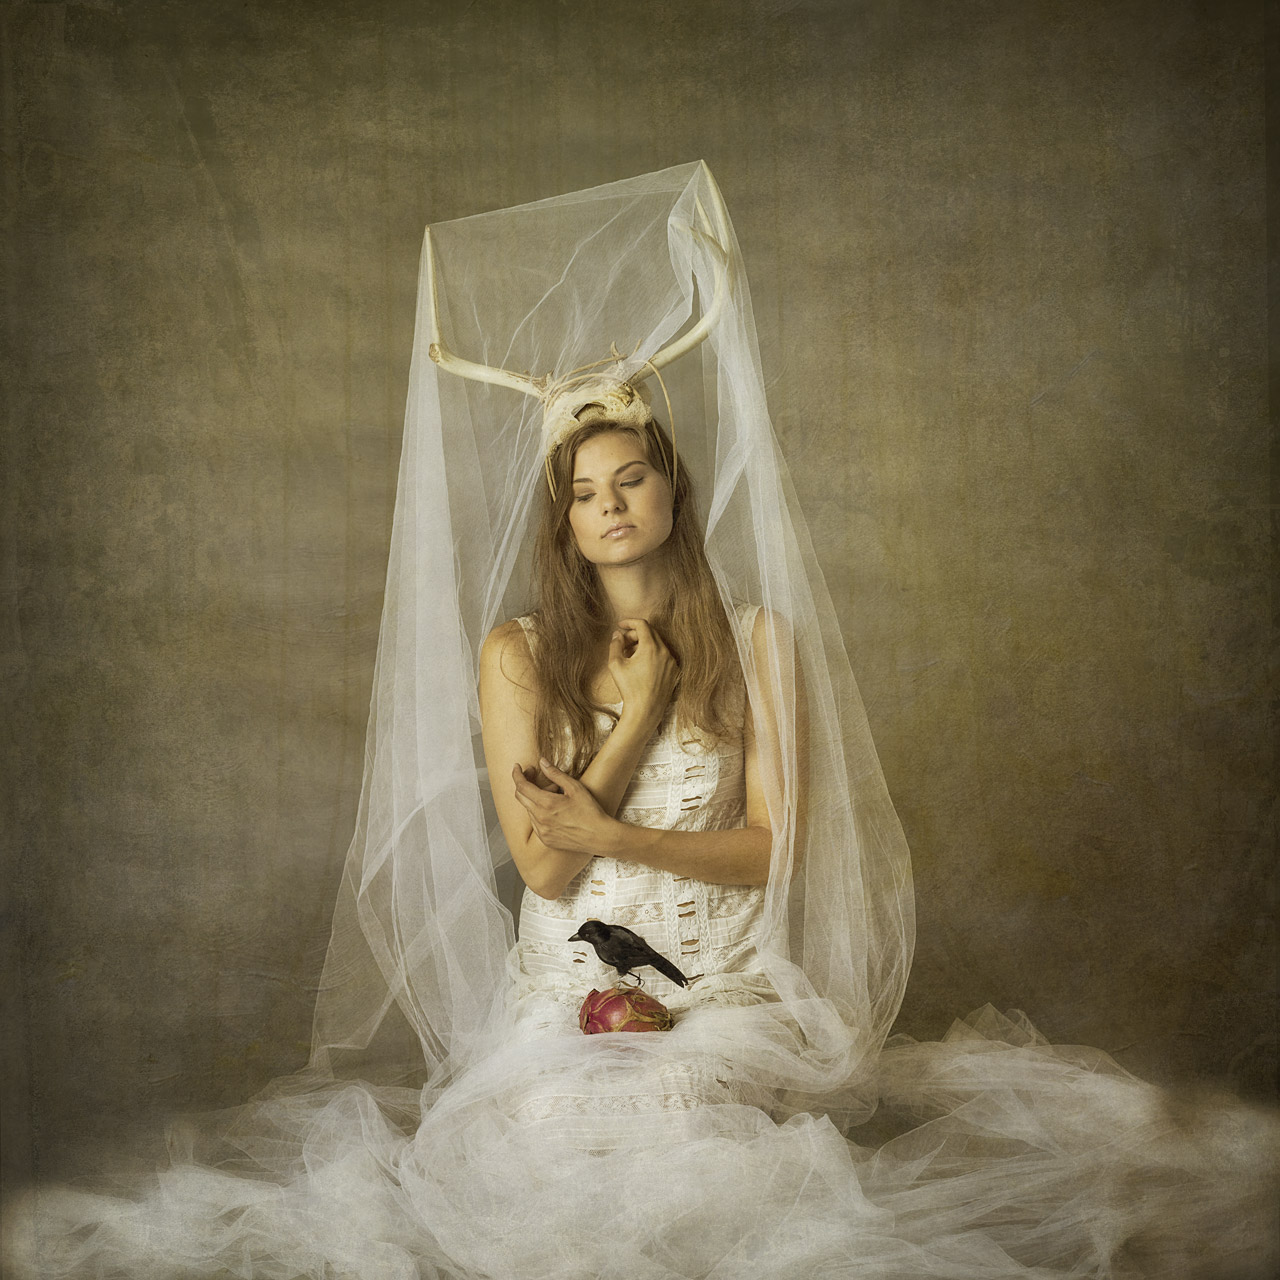 Brooke Long Nude july 2014 – michael pannier